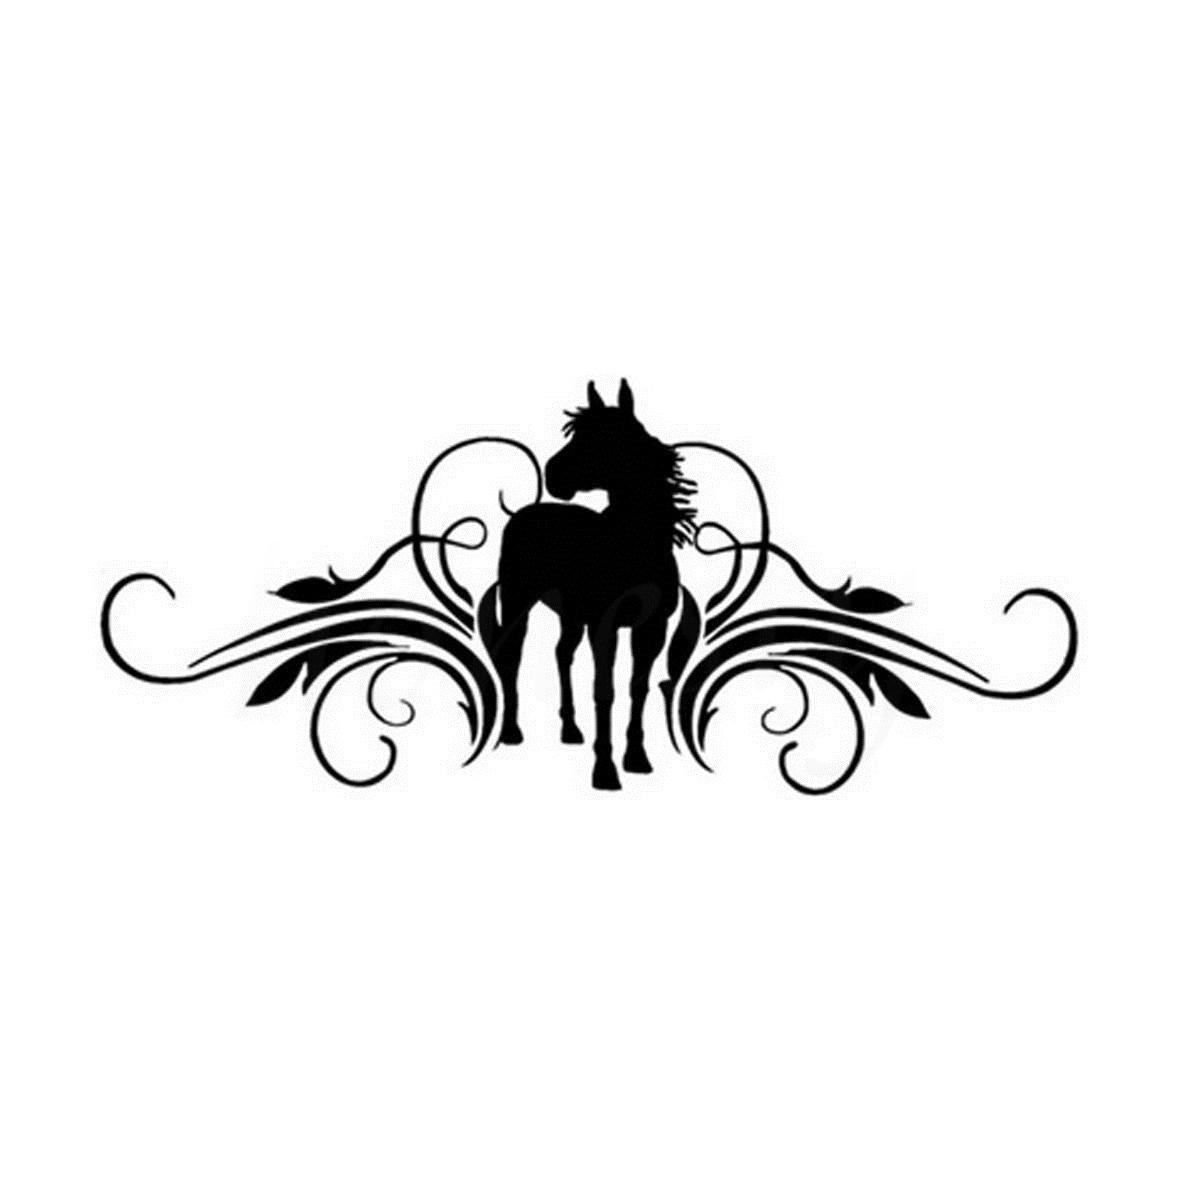 Online Get Cheap Laptop Stickers Horses Aliexpresscom Alibaba -  horse graphics for trucks